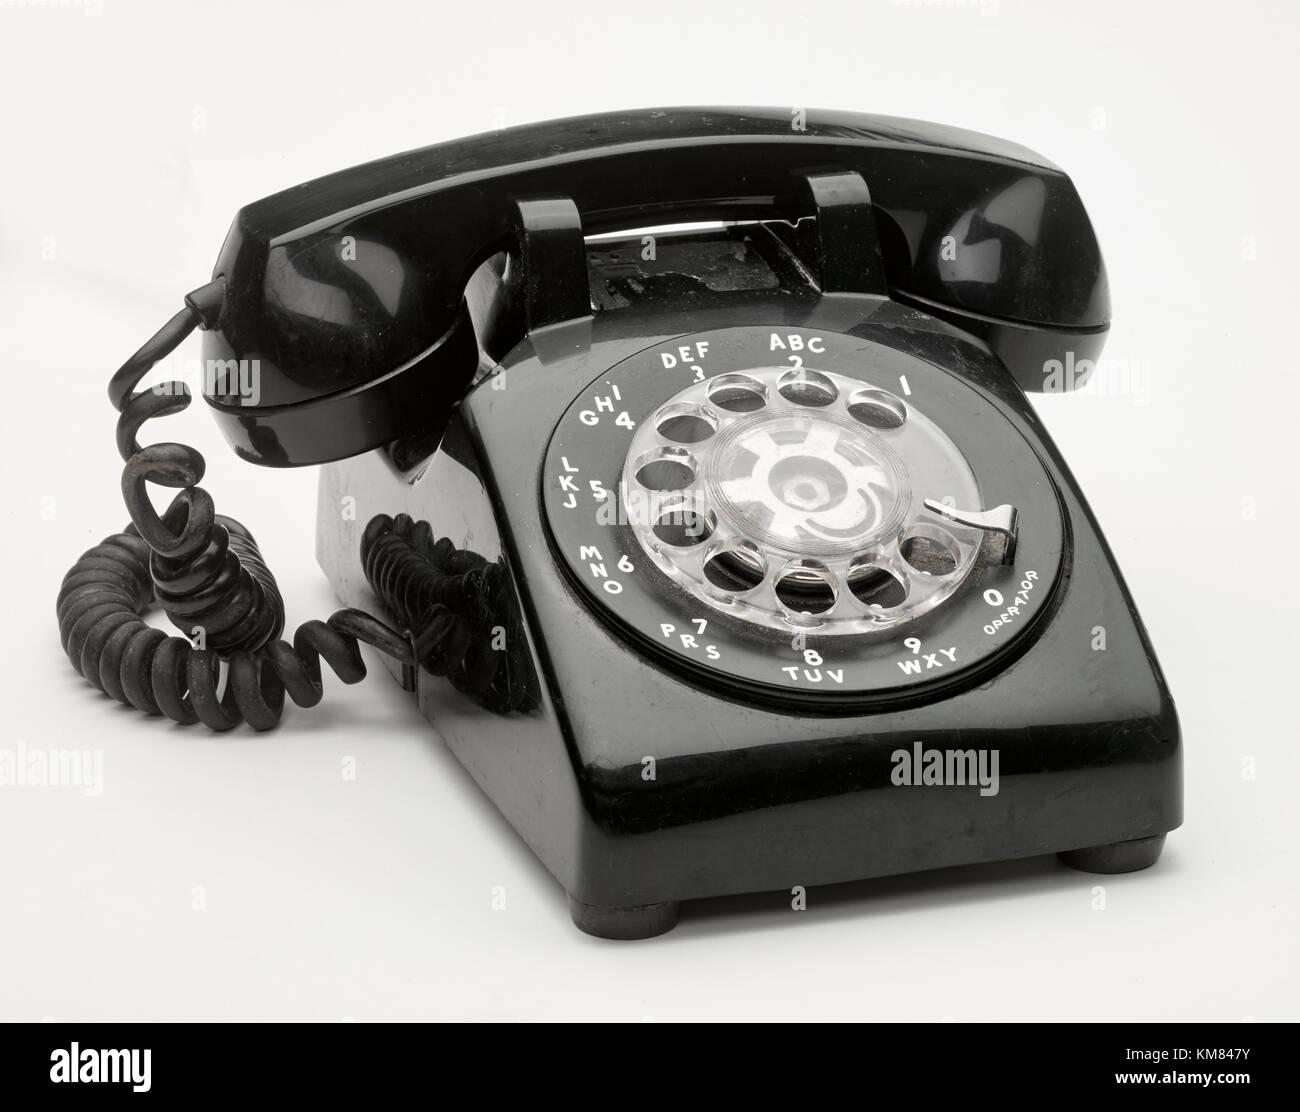 Black Rotary Telephone - Stock Image